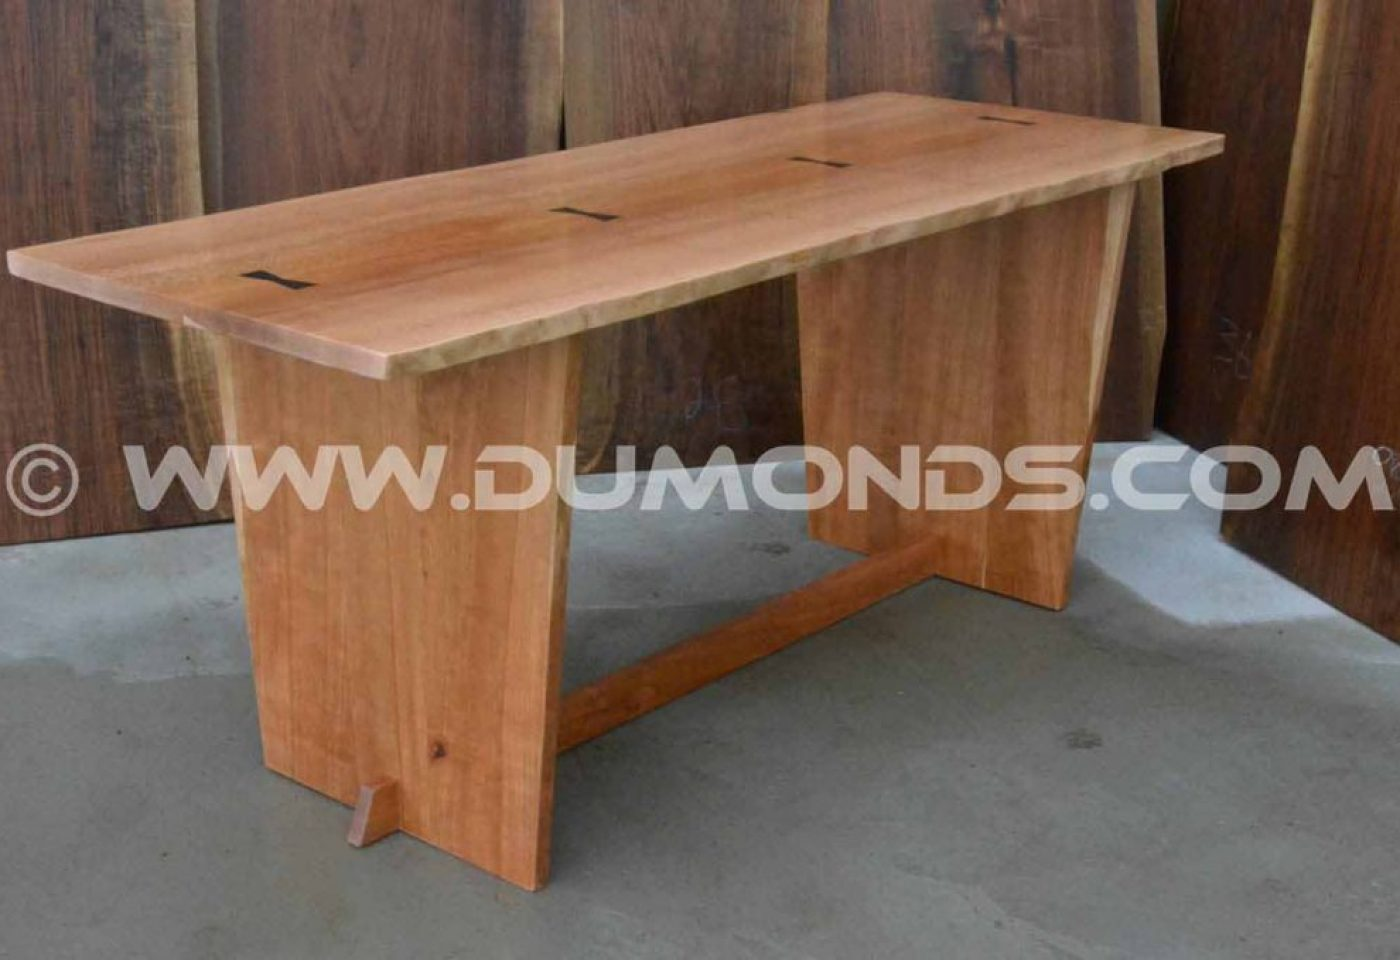 CHERRY TRESTLE TABLE BASE UNDER A 6'